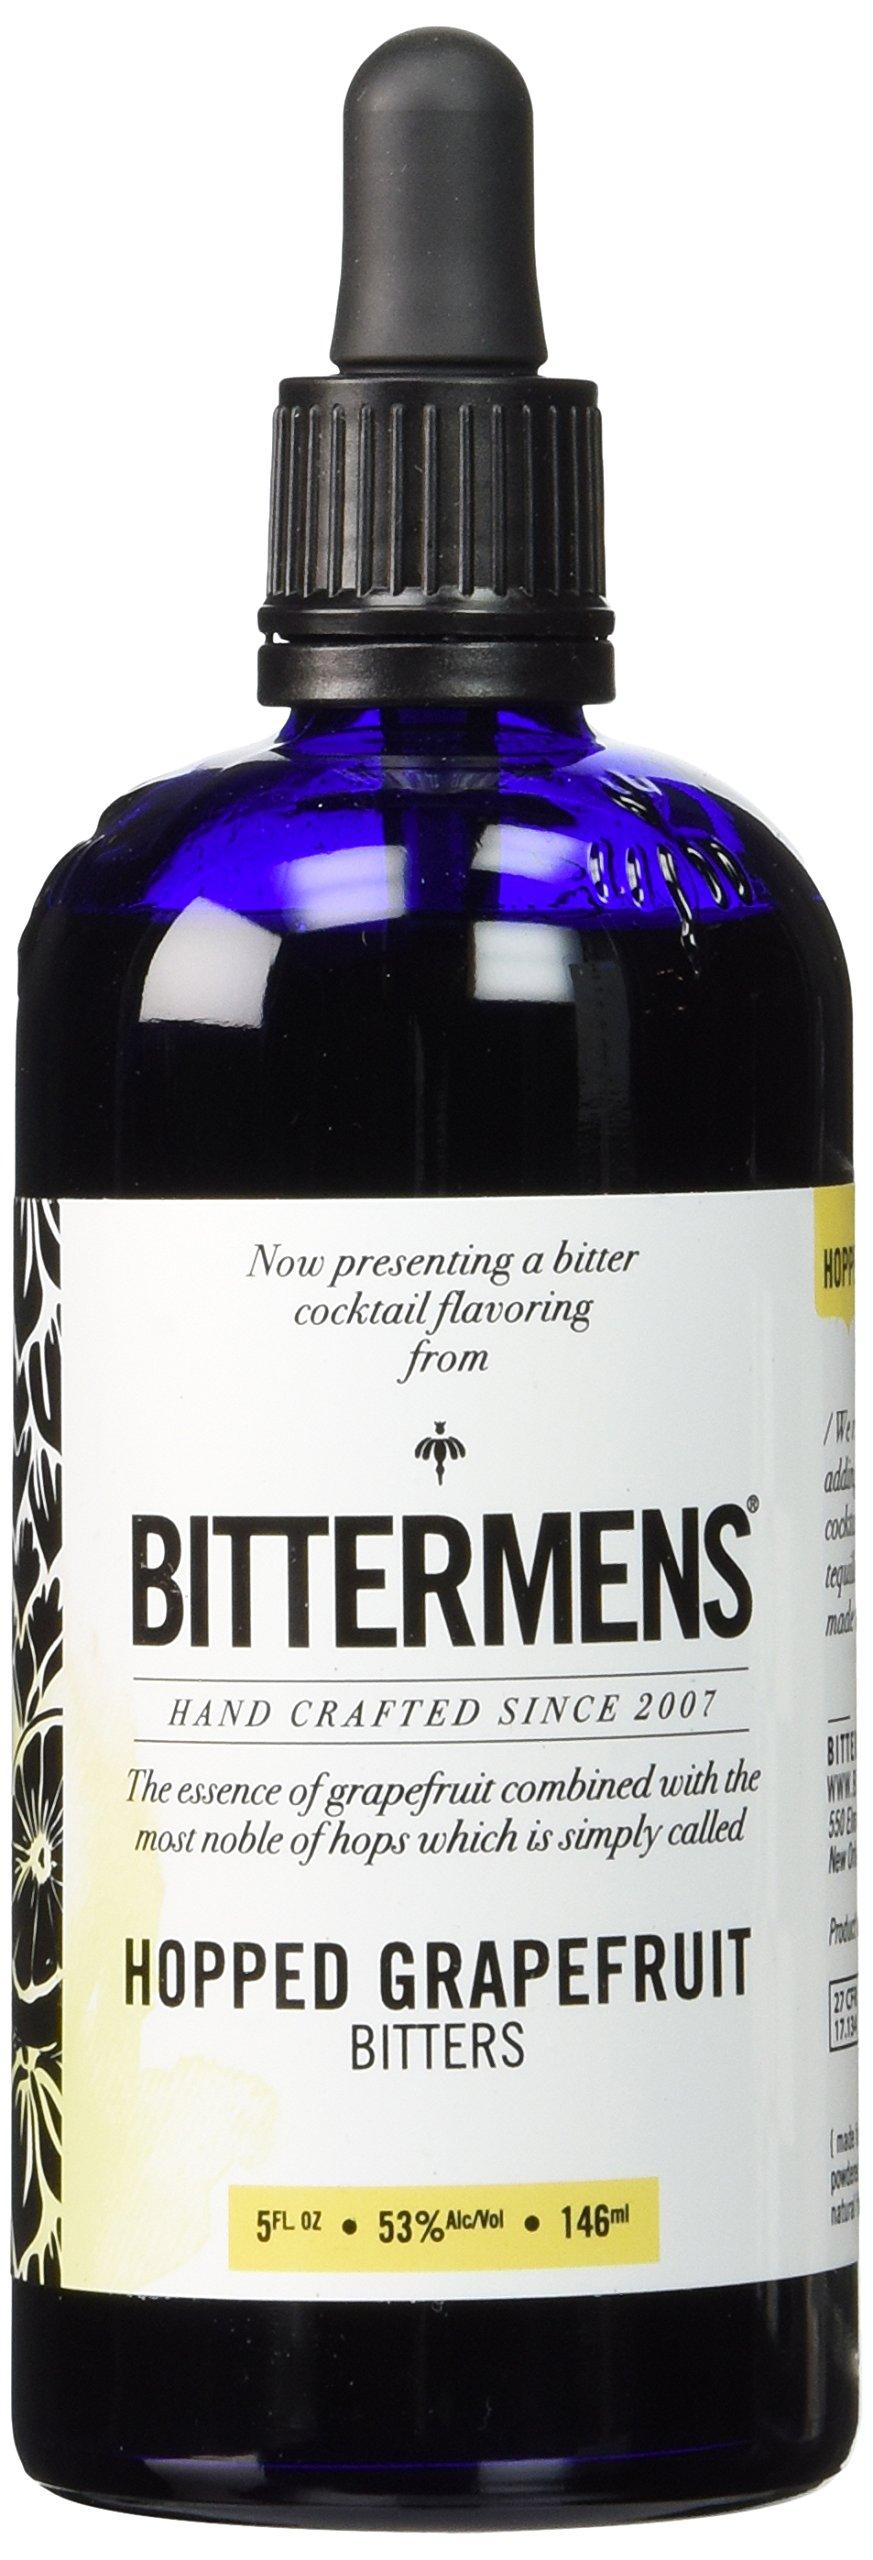 Bittermens® Hopped Grapefruit Bitters - 5oz